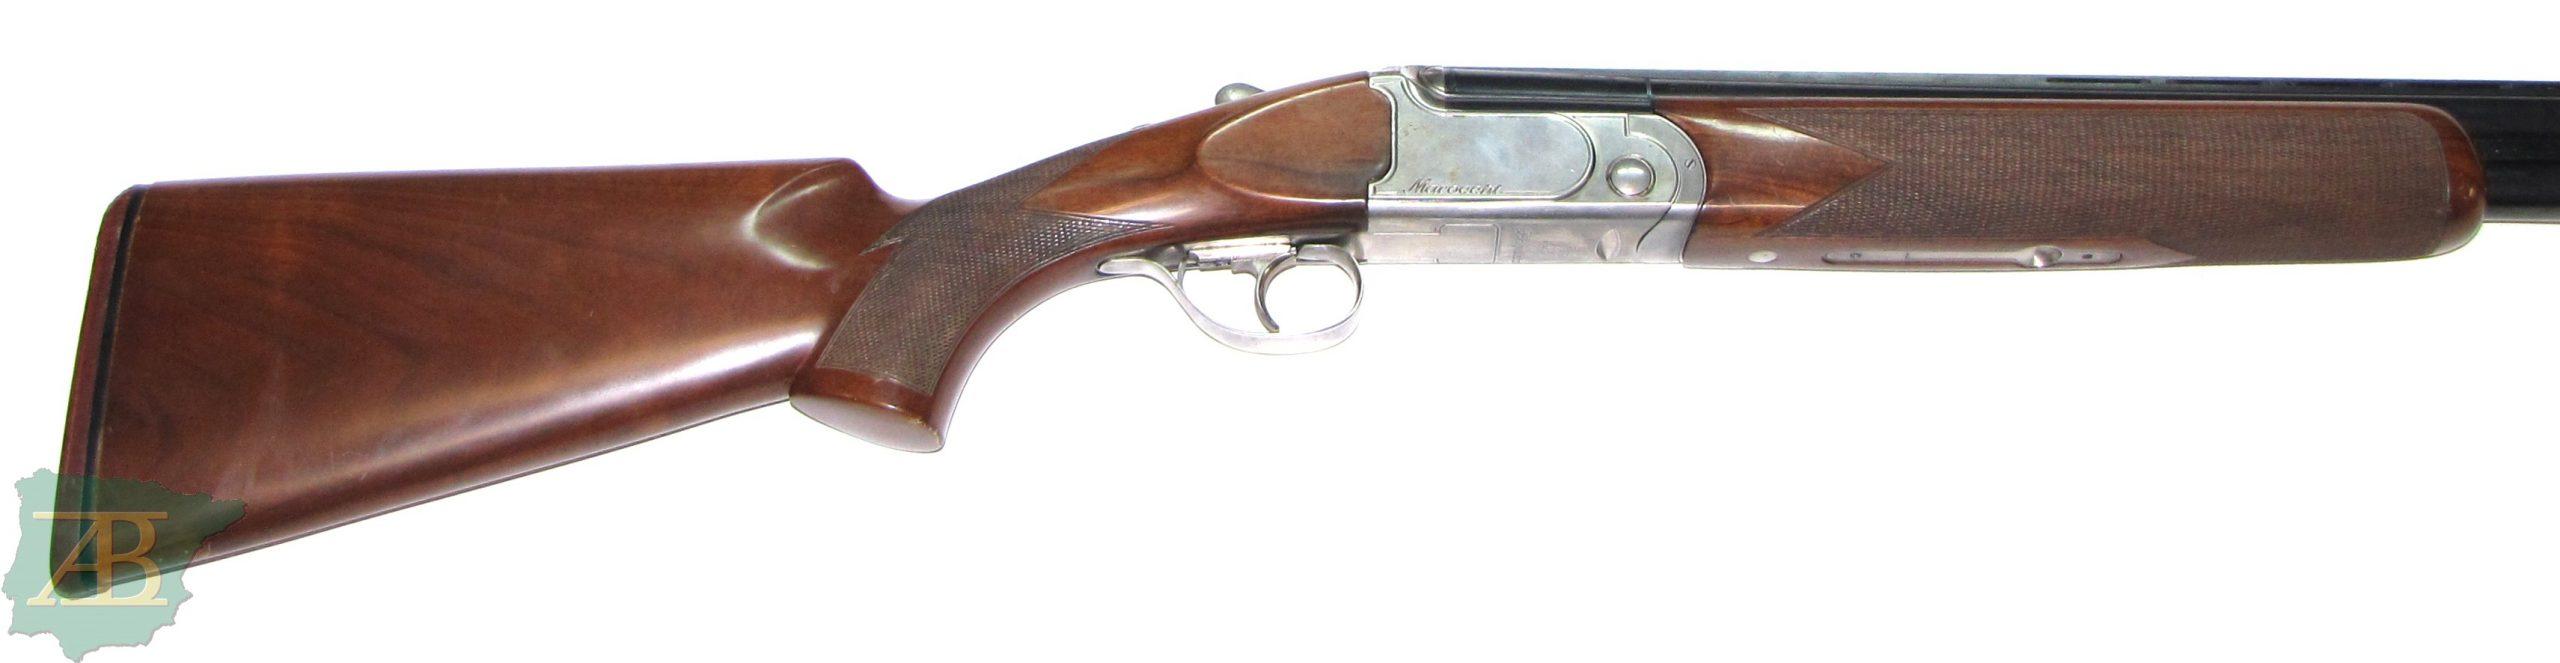 Escopeta superpuesta de TRAP MAROCCHI CONQUISTA Ref 5589-armeriaiberica-2